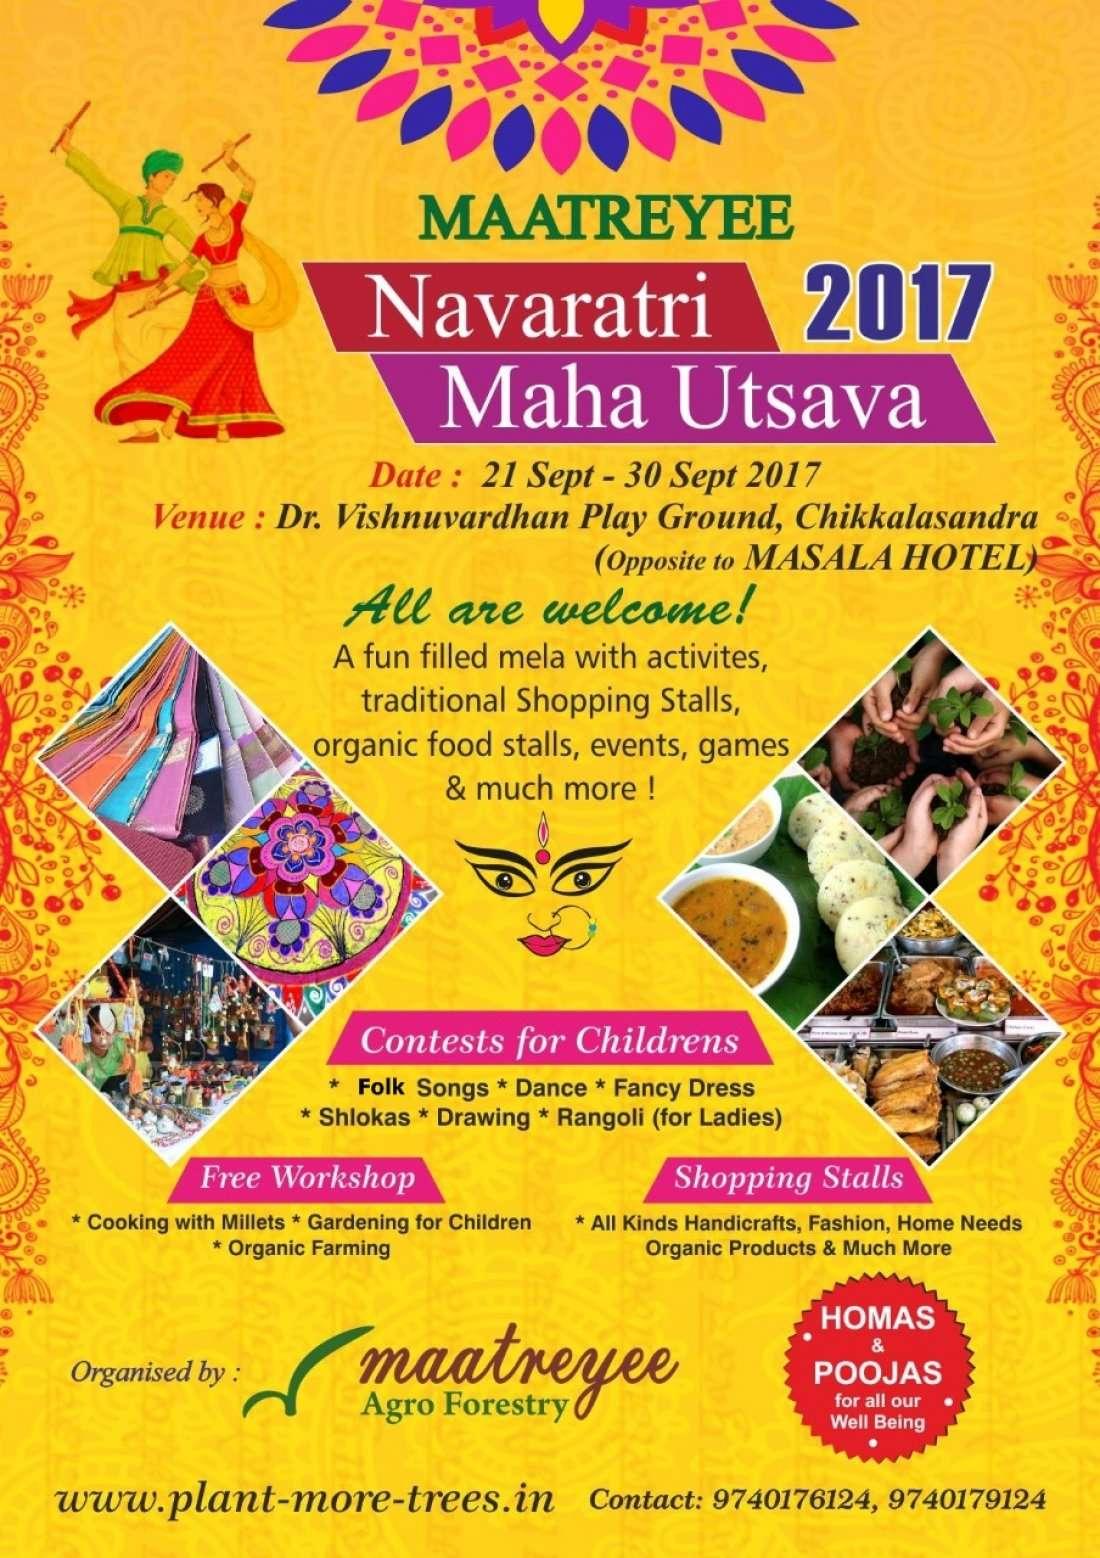 Navaratri Maha Utsava - Fun filled extravaganza